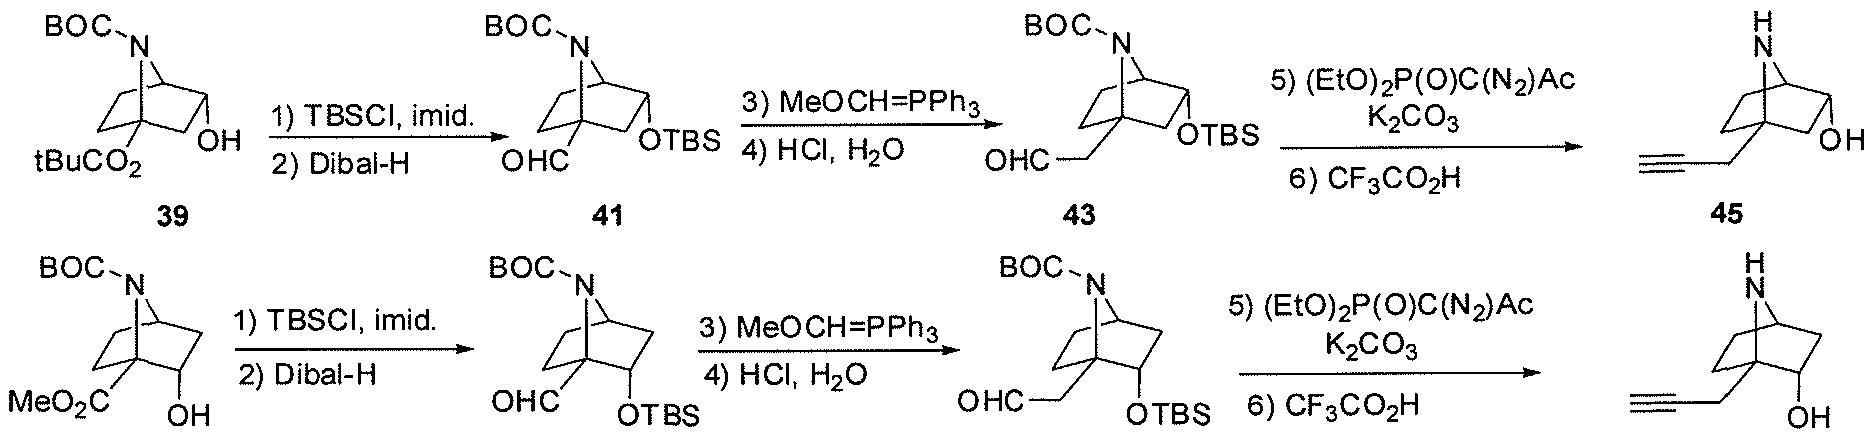 WO2009025919A2 - 5-propargyl-pyrimidine derivatives as